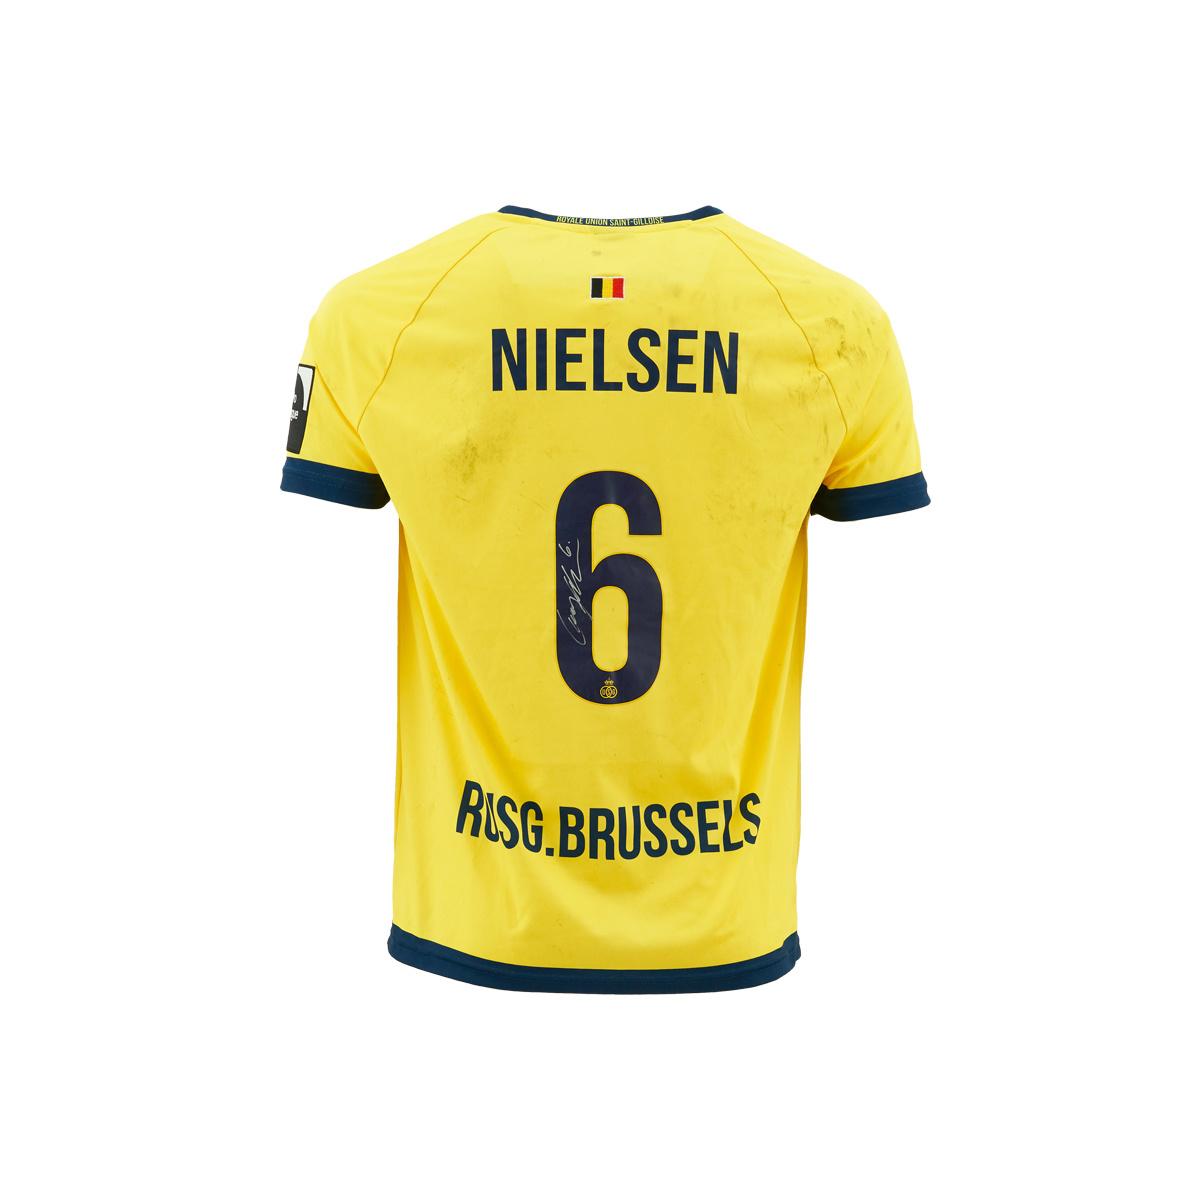 Topfanz #6 Casper Nielsen